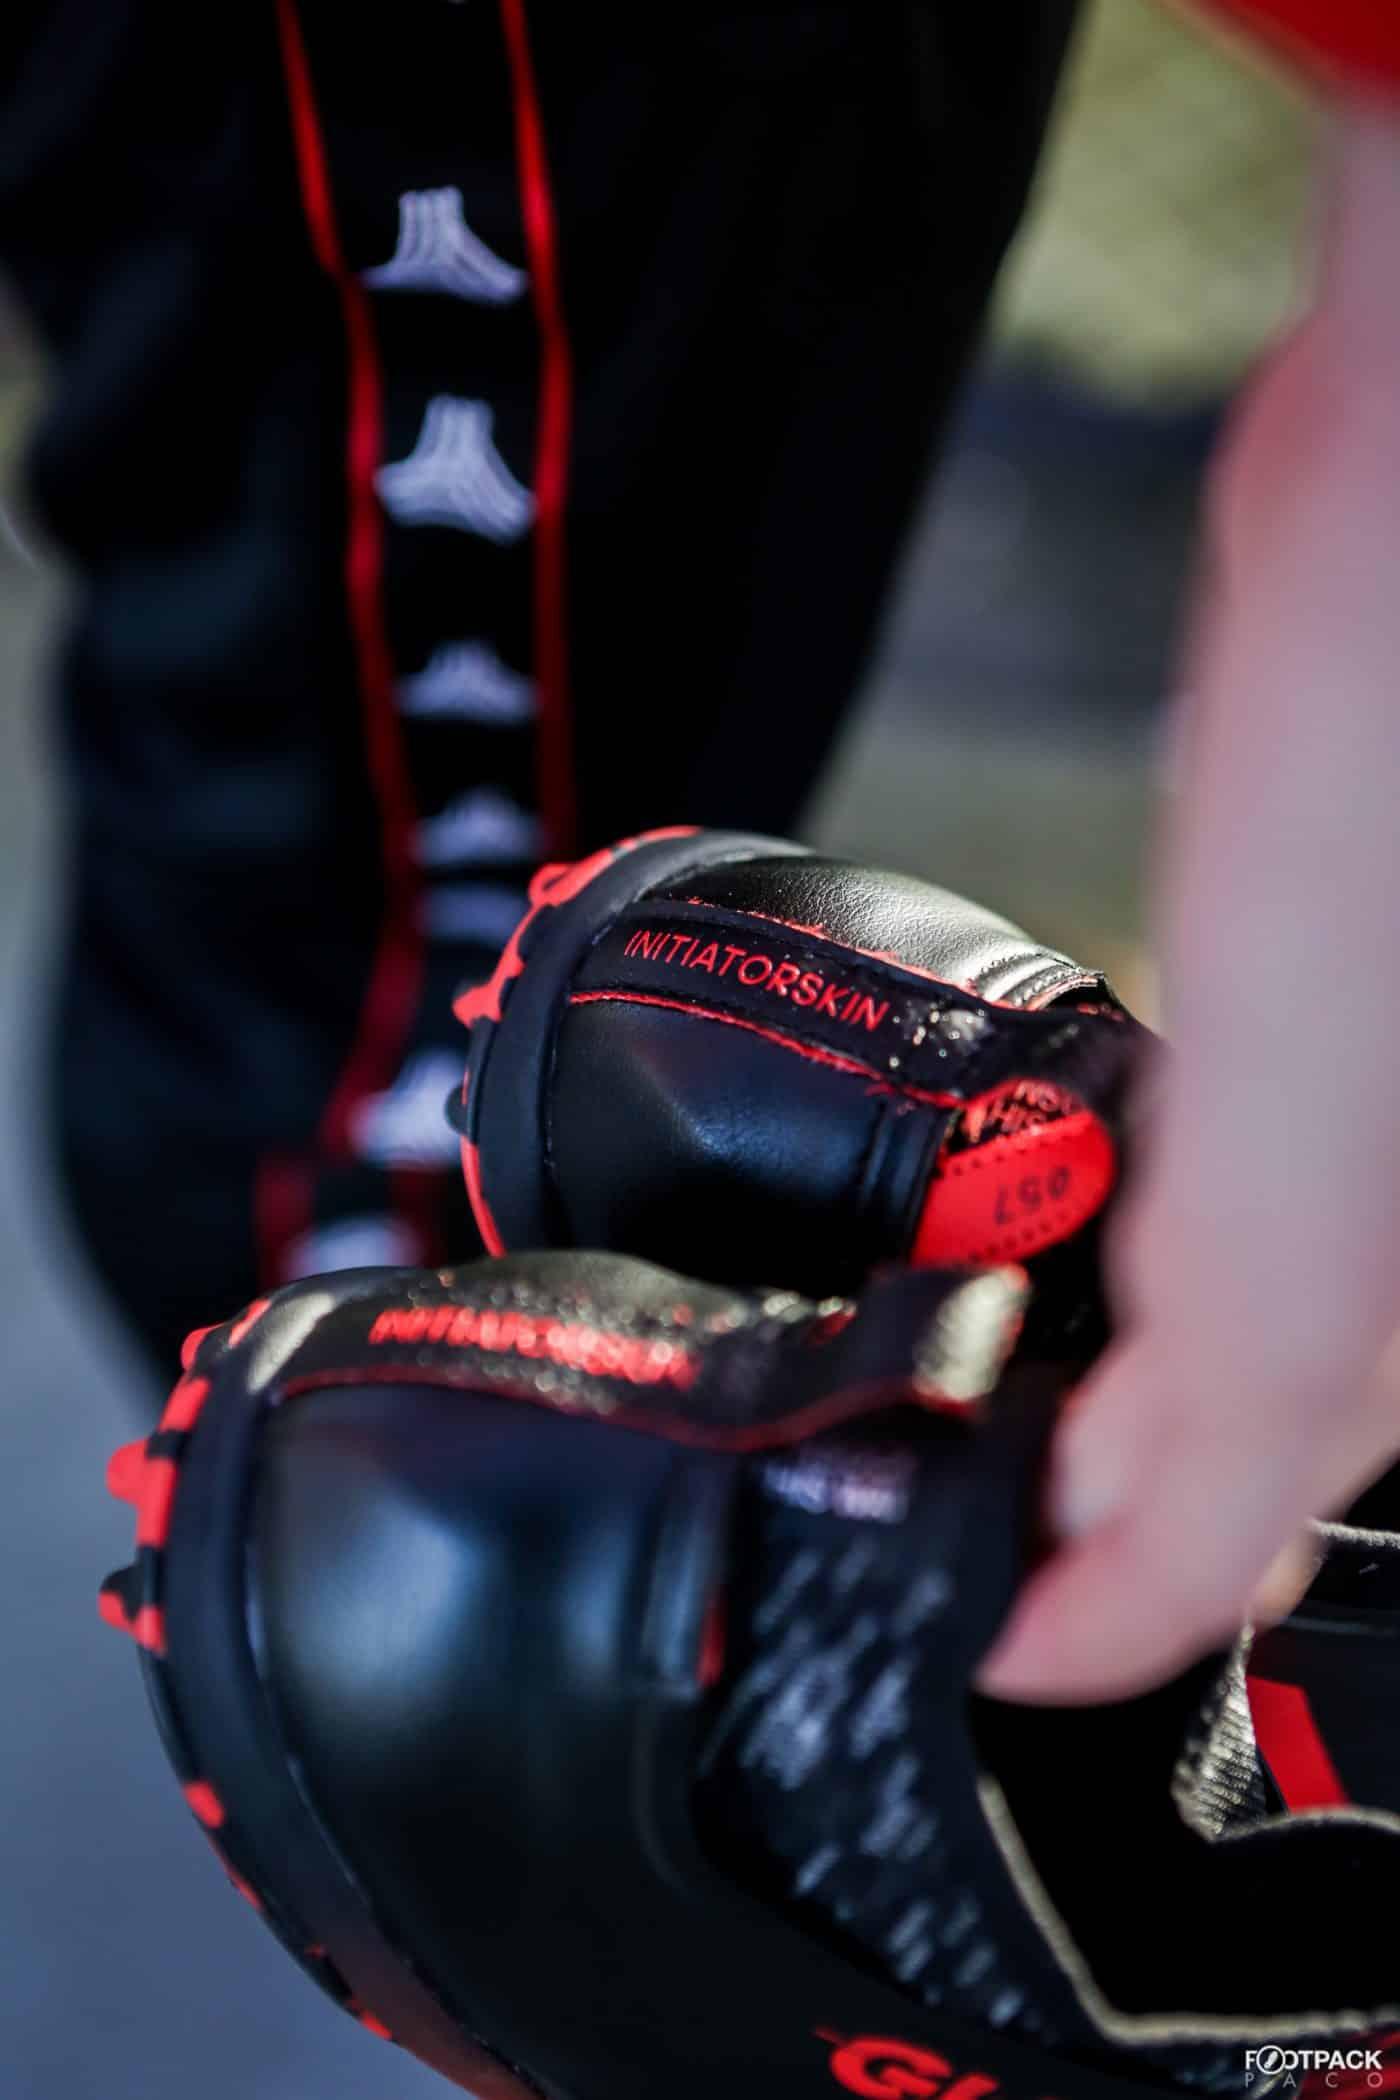 adidas-glitch-initiator-pack-turf-footpack-4